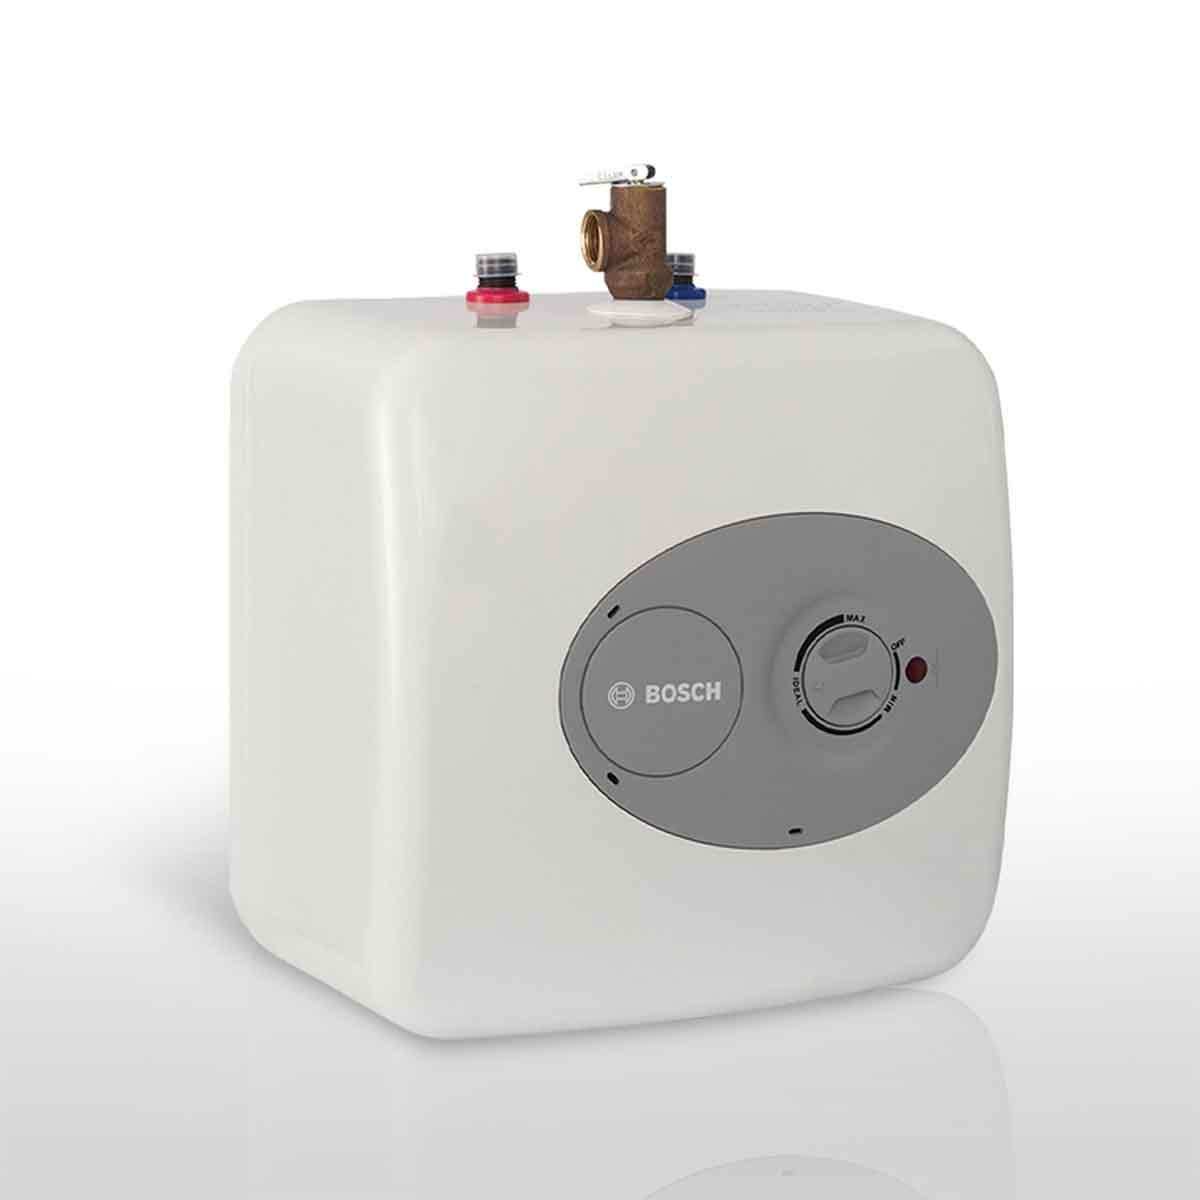 Calentador Deposito Electronico 1 1/2 Servicios 15 L Bosch